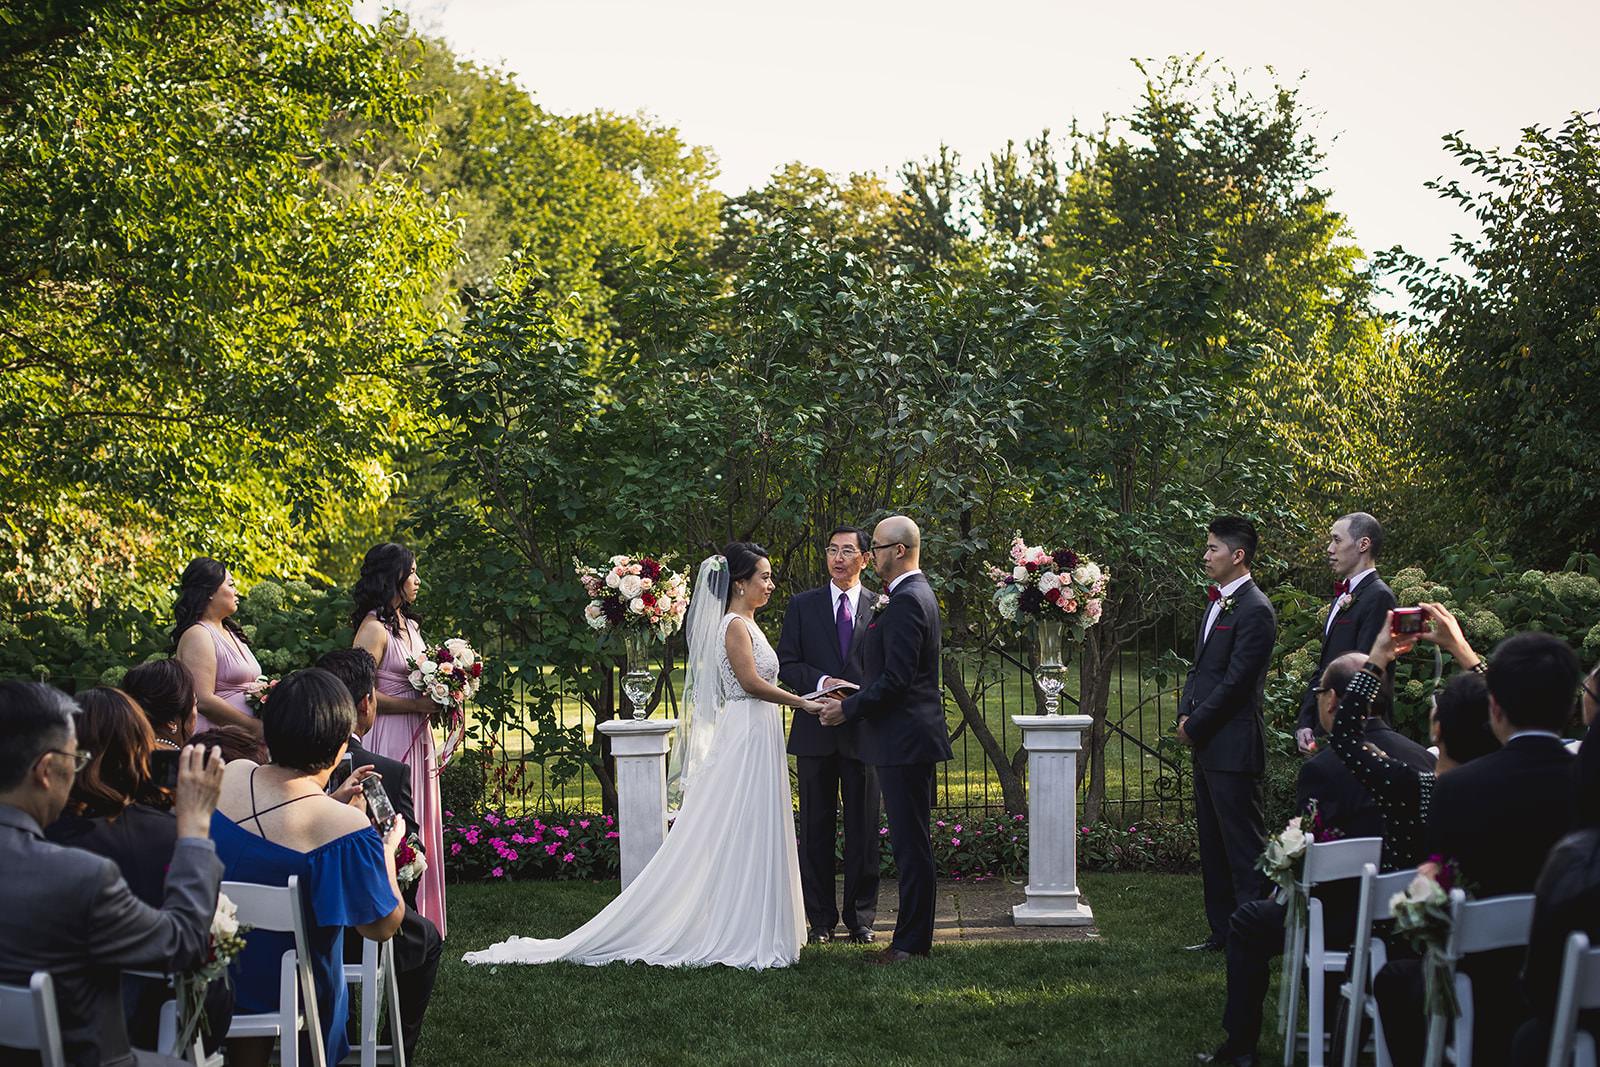 graydon hall wedding ceremony outside